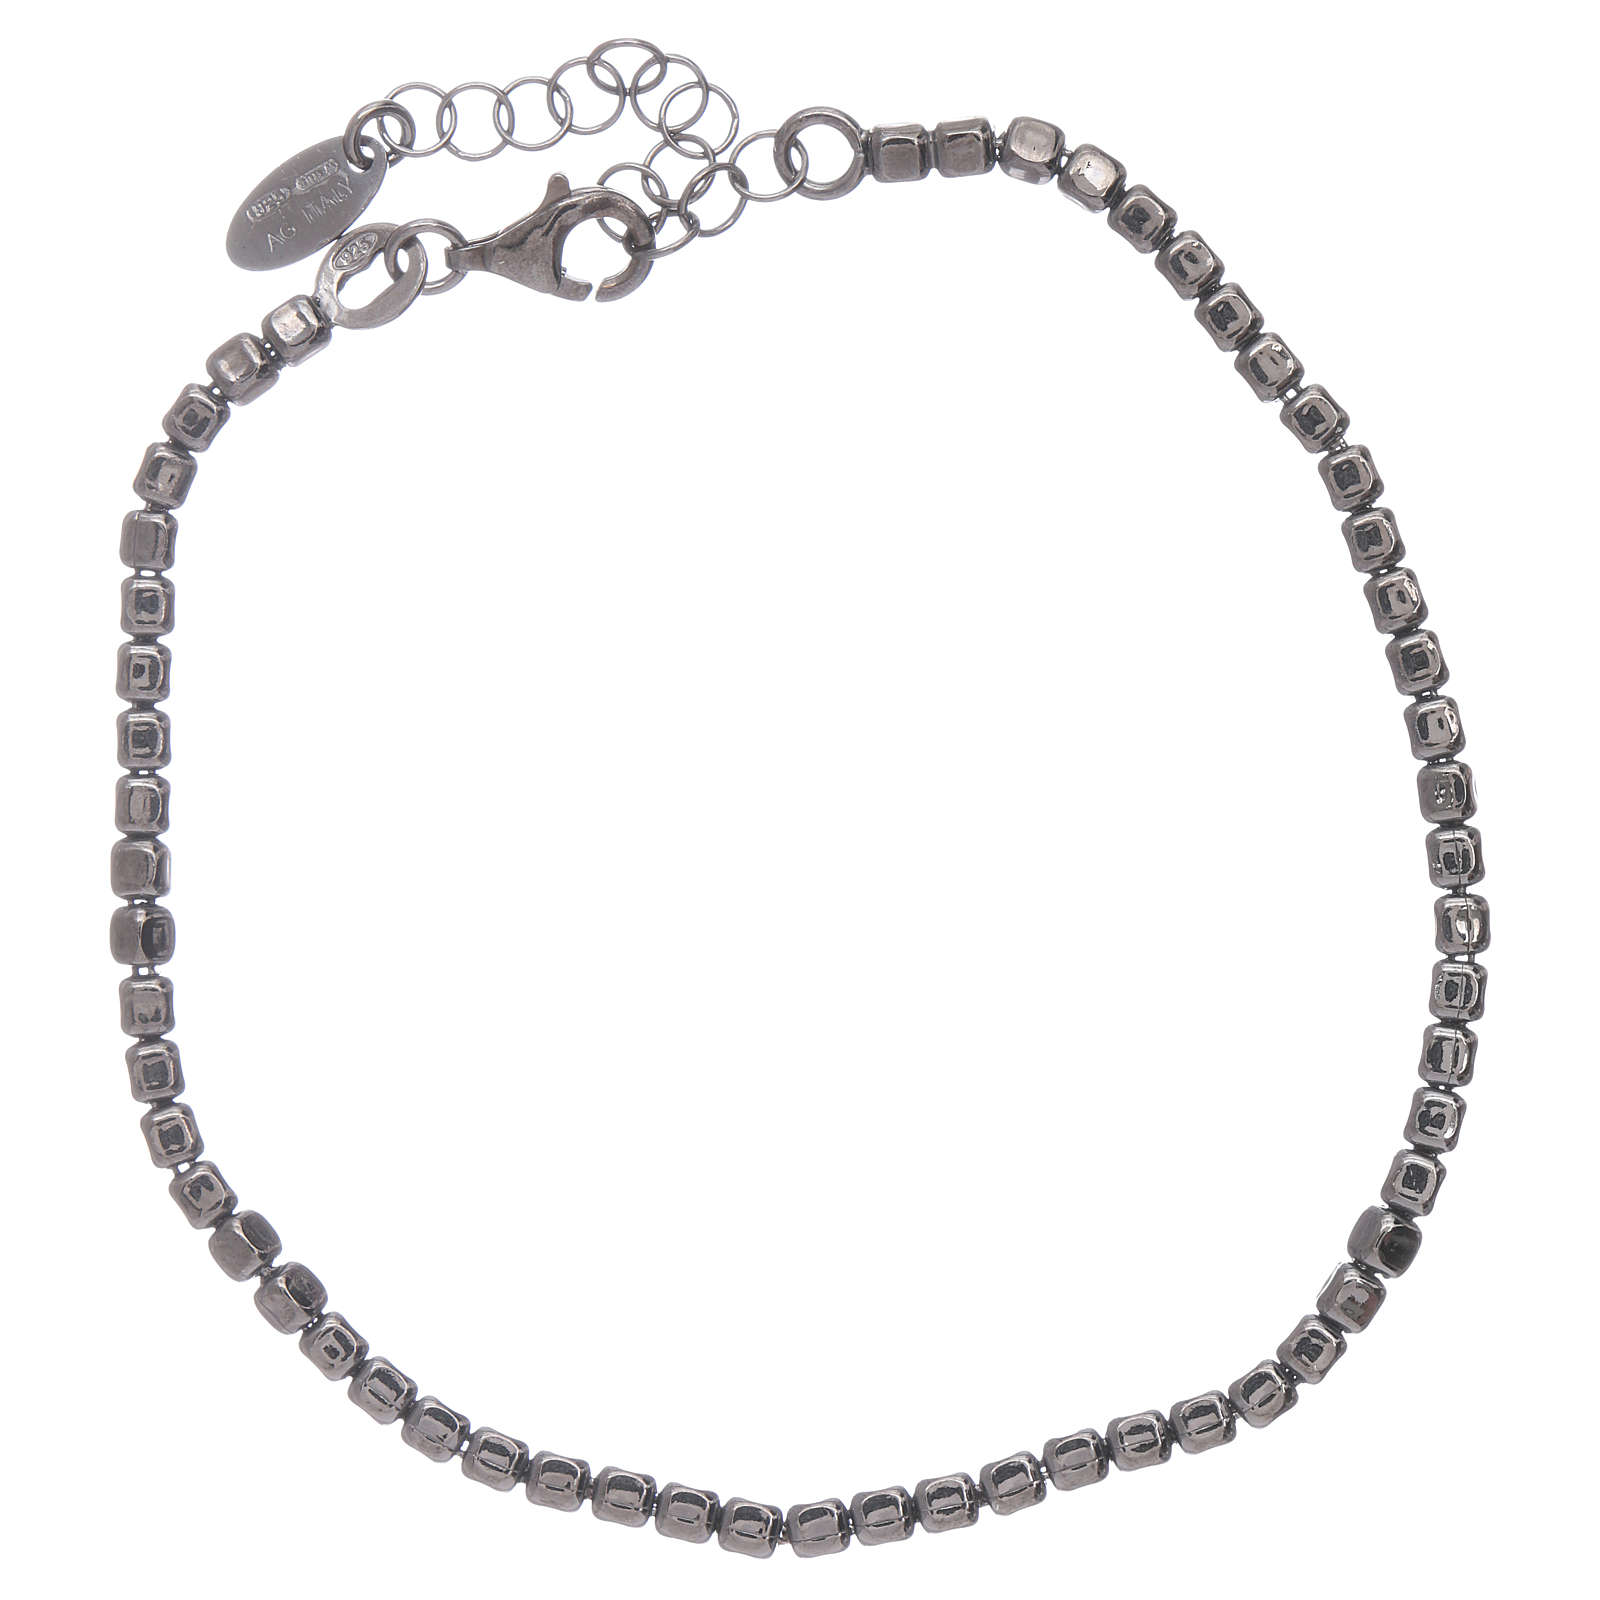 AMEN 925 rhodium plated sterling silver bracelet 4